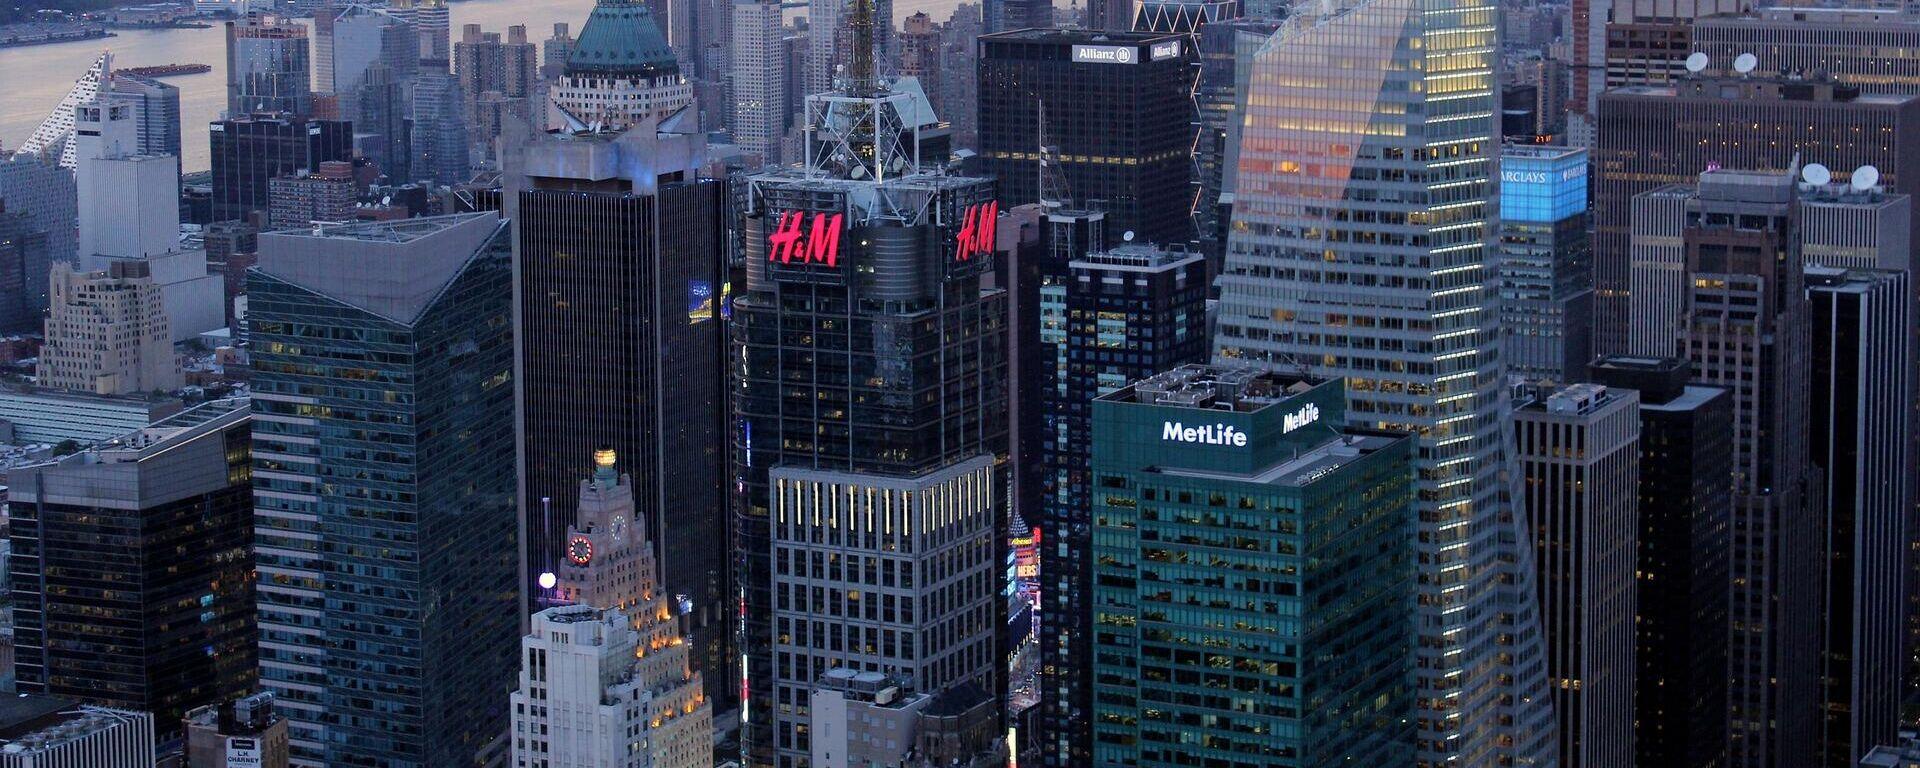 H&M, New York, Symbolbild - SNA, 1920, 05.02.2021